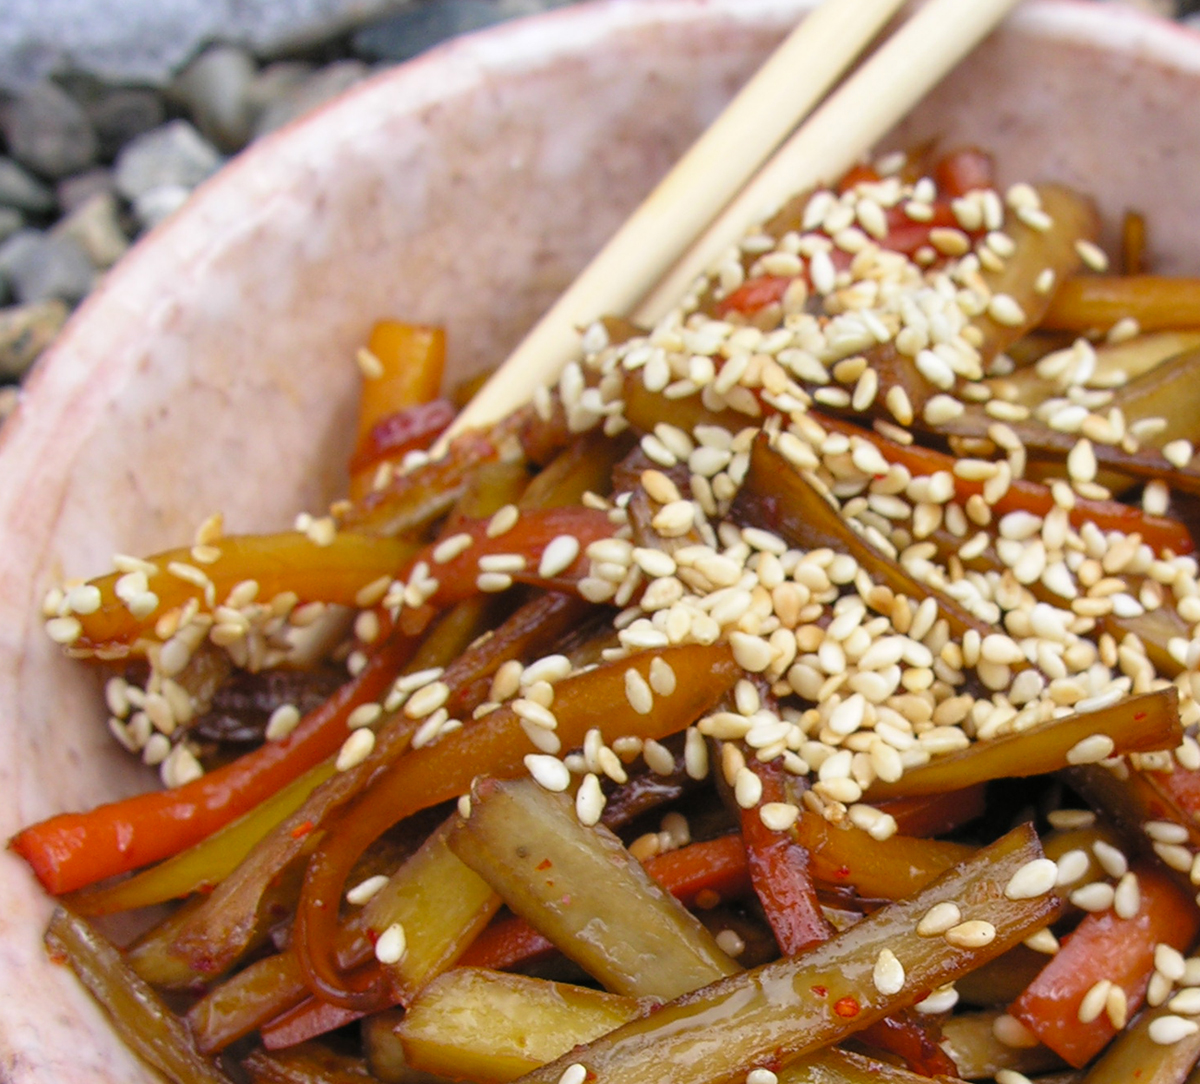 Kimpira (Stir-fried Carrot & Burdock Root)